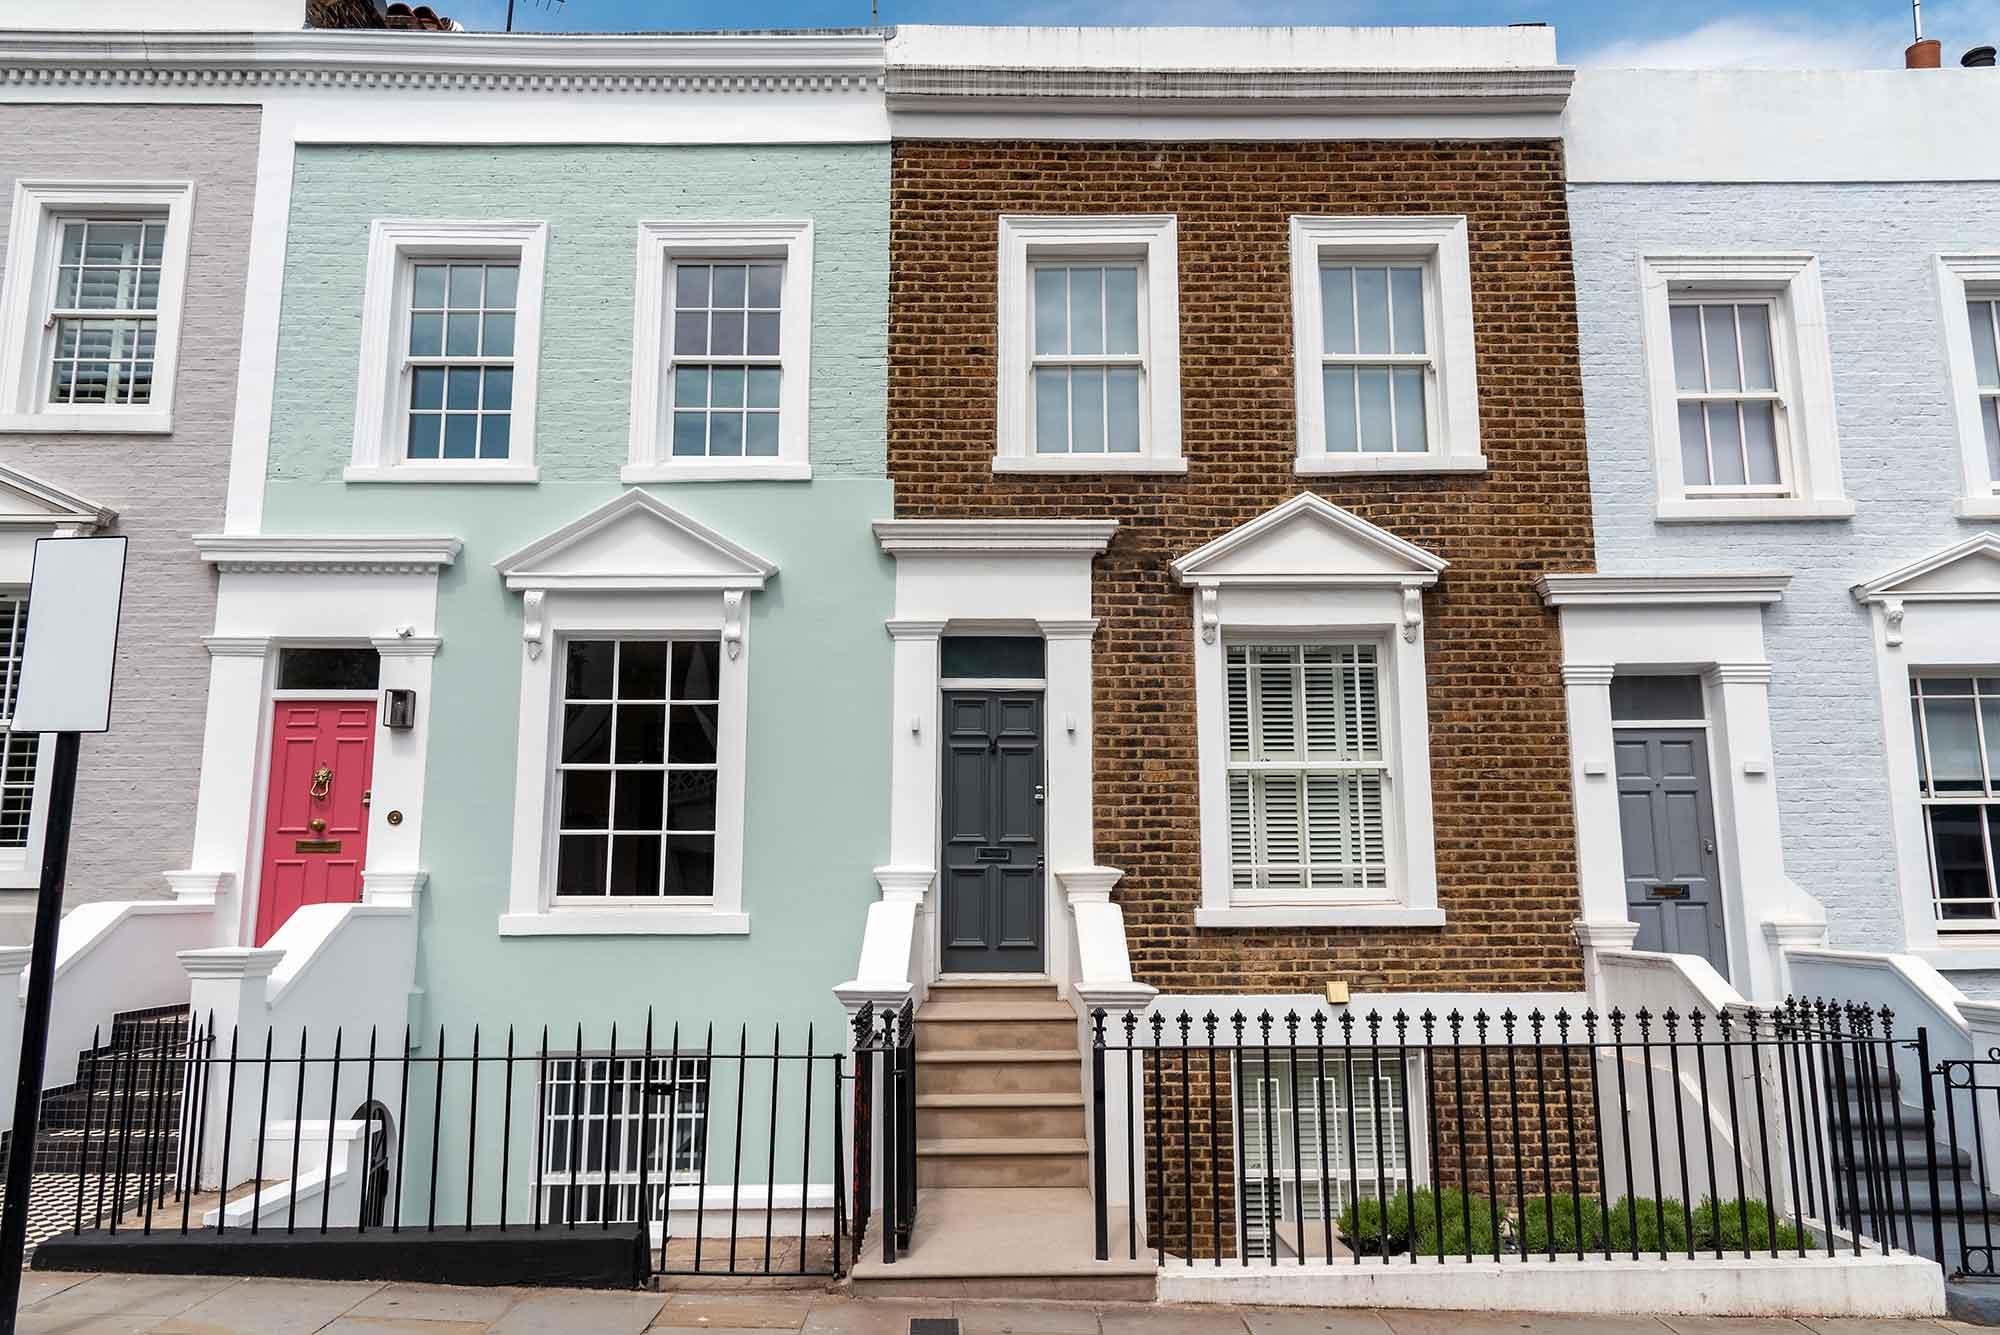 row-houses-small